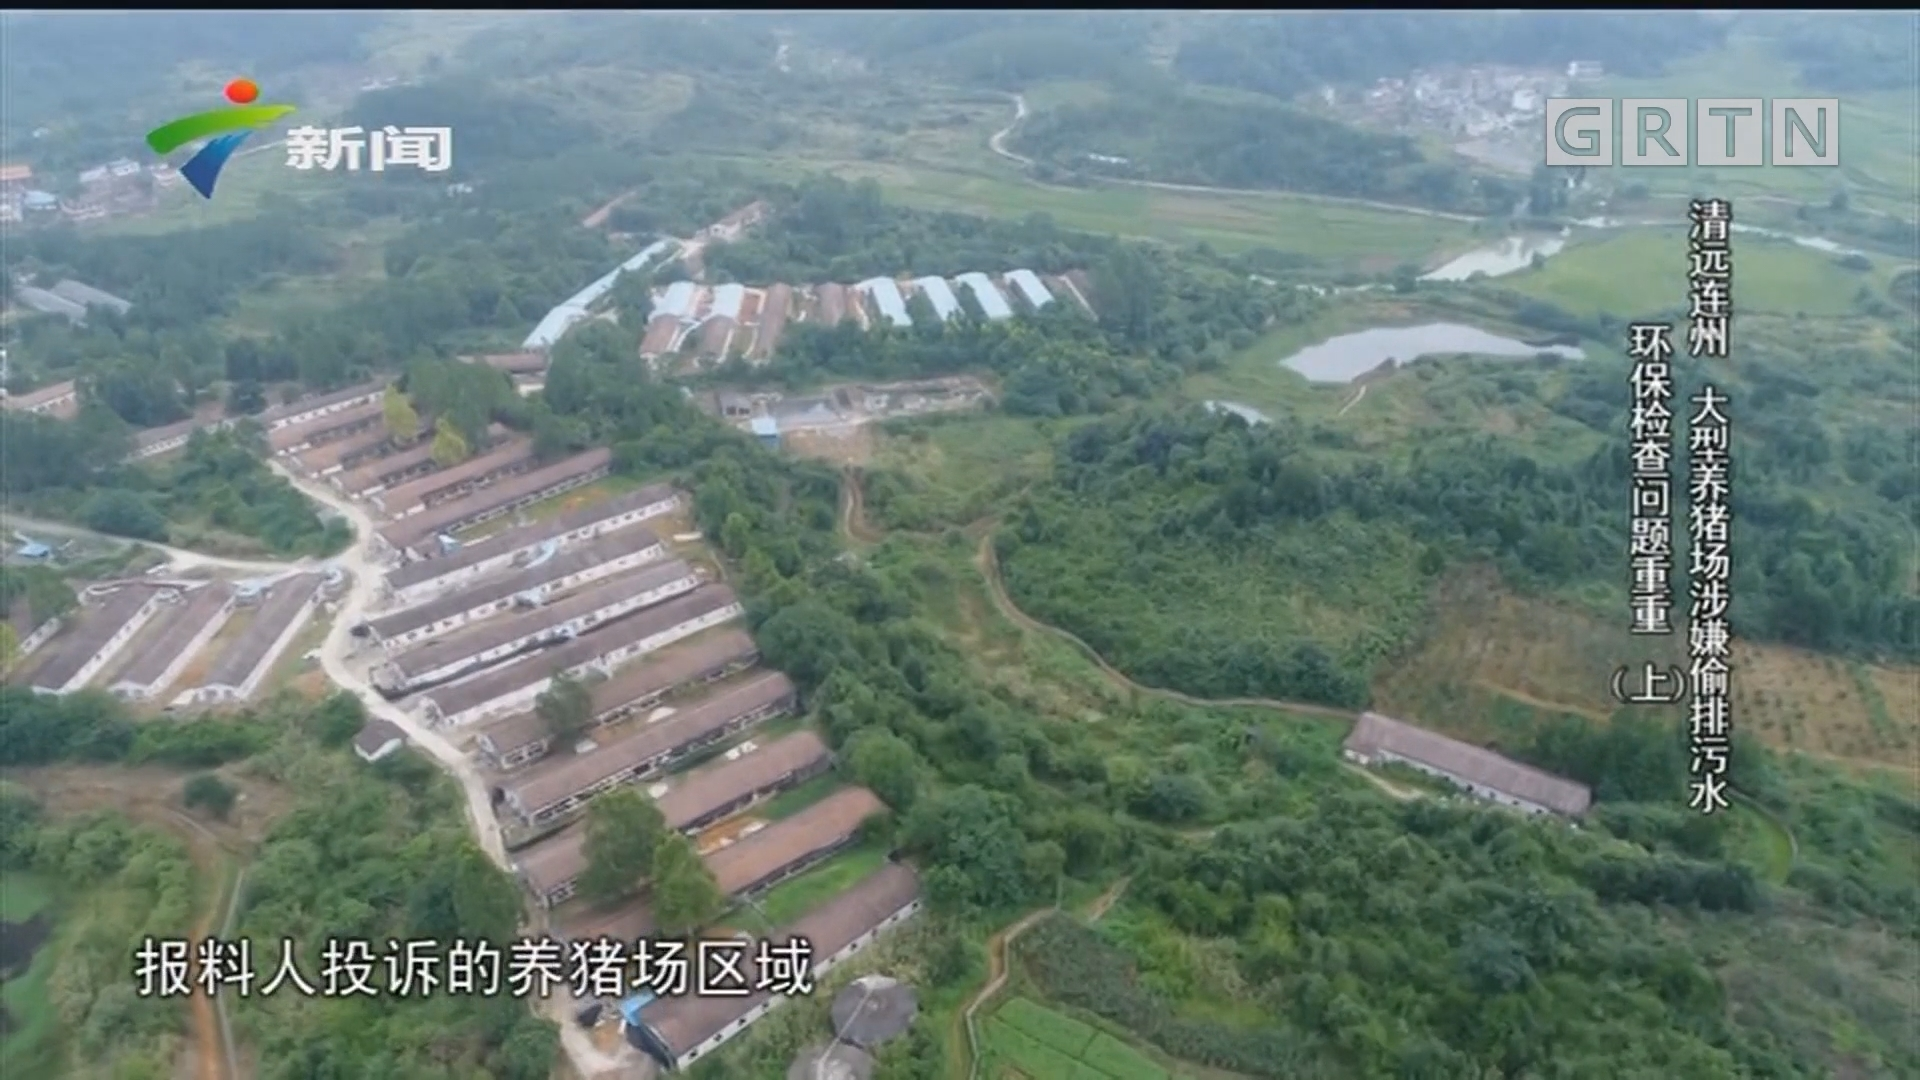 [HD][2019-07-15]社会纵横:清远连州 大型养猪场涉嫌偷排污水 环保检查问题重重(上)